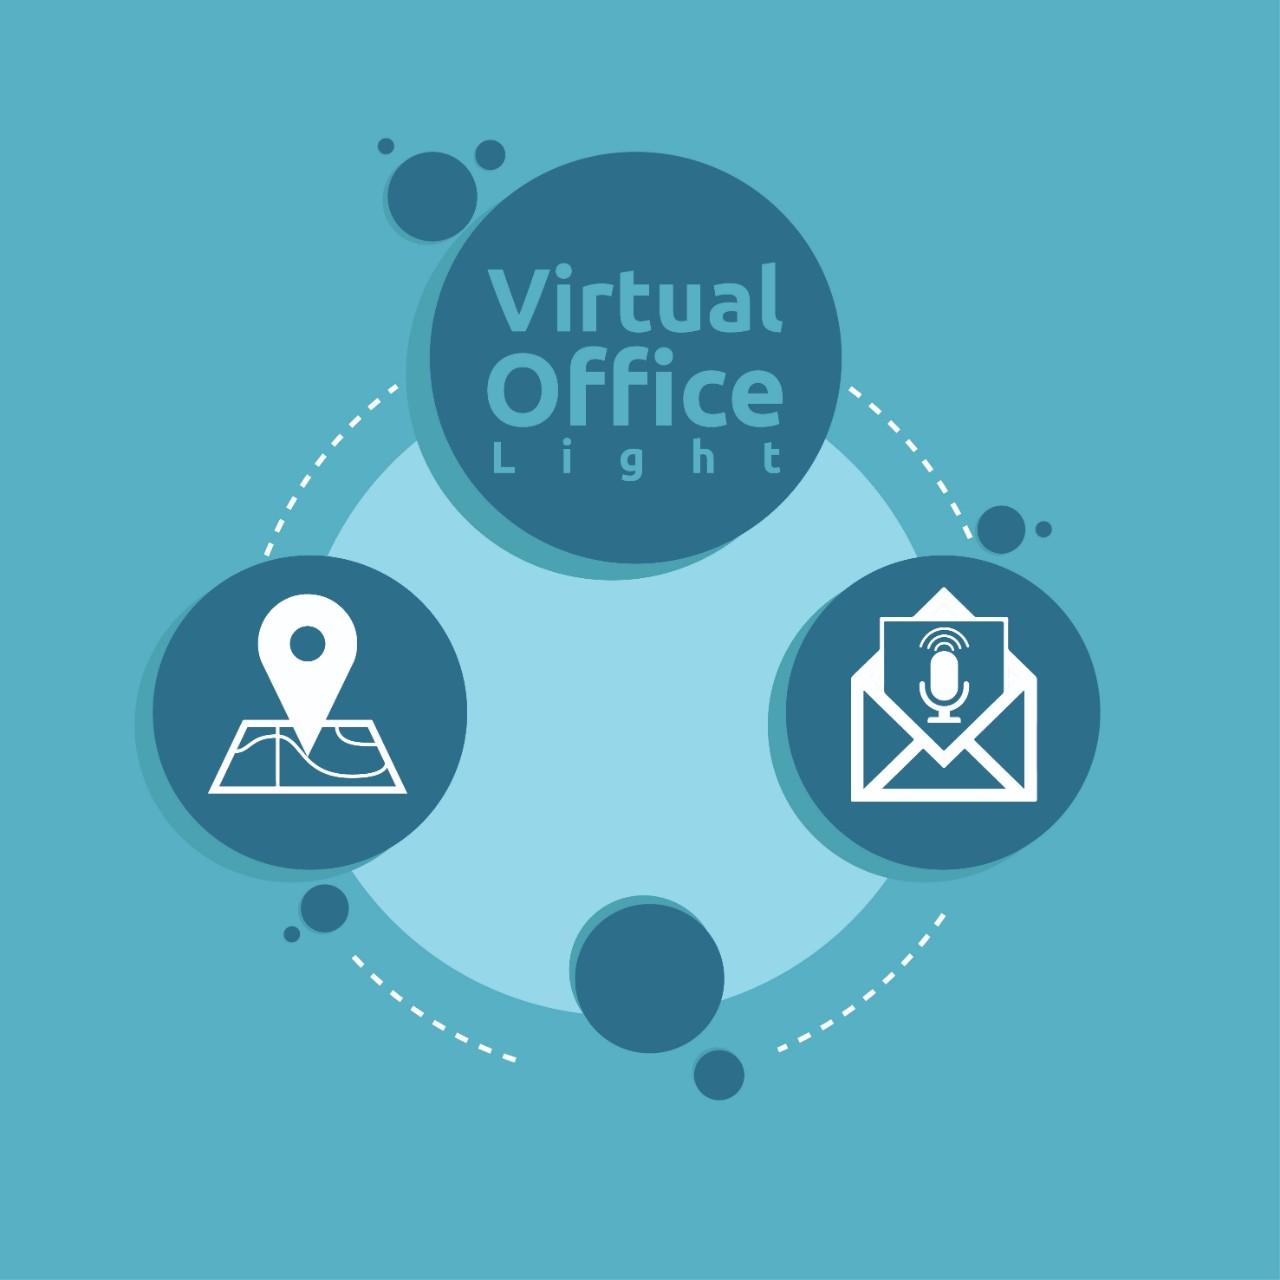 Virtual Office Light